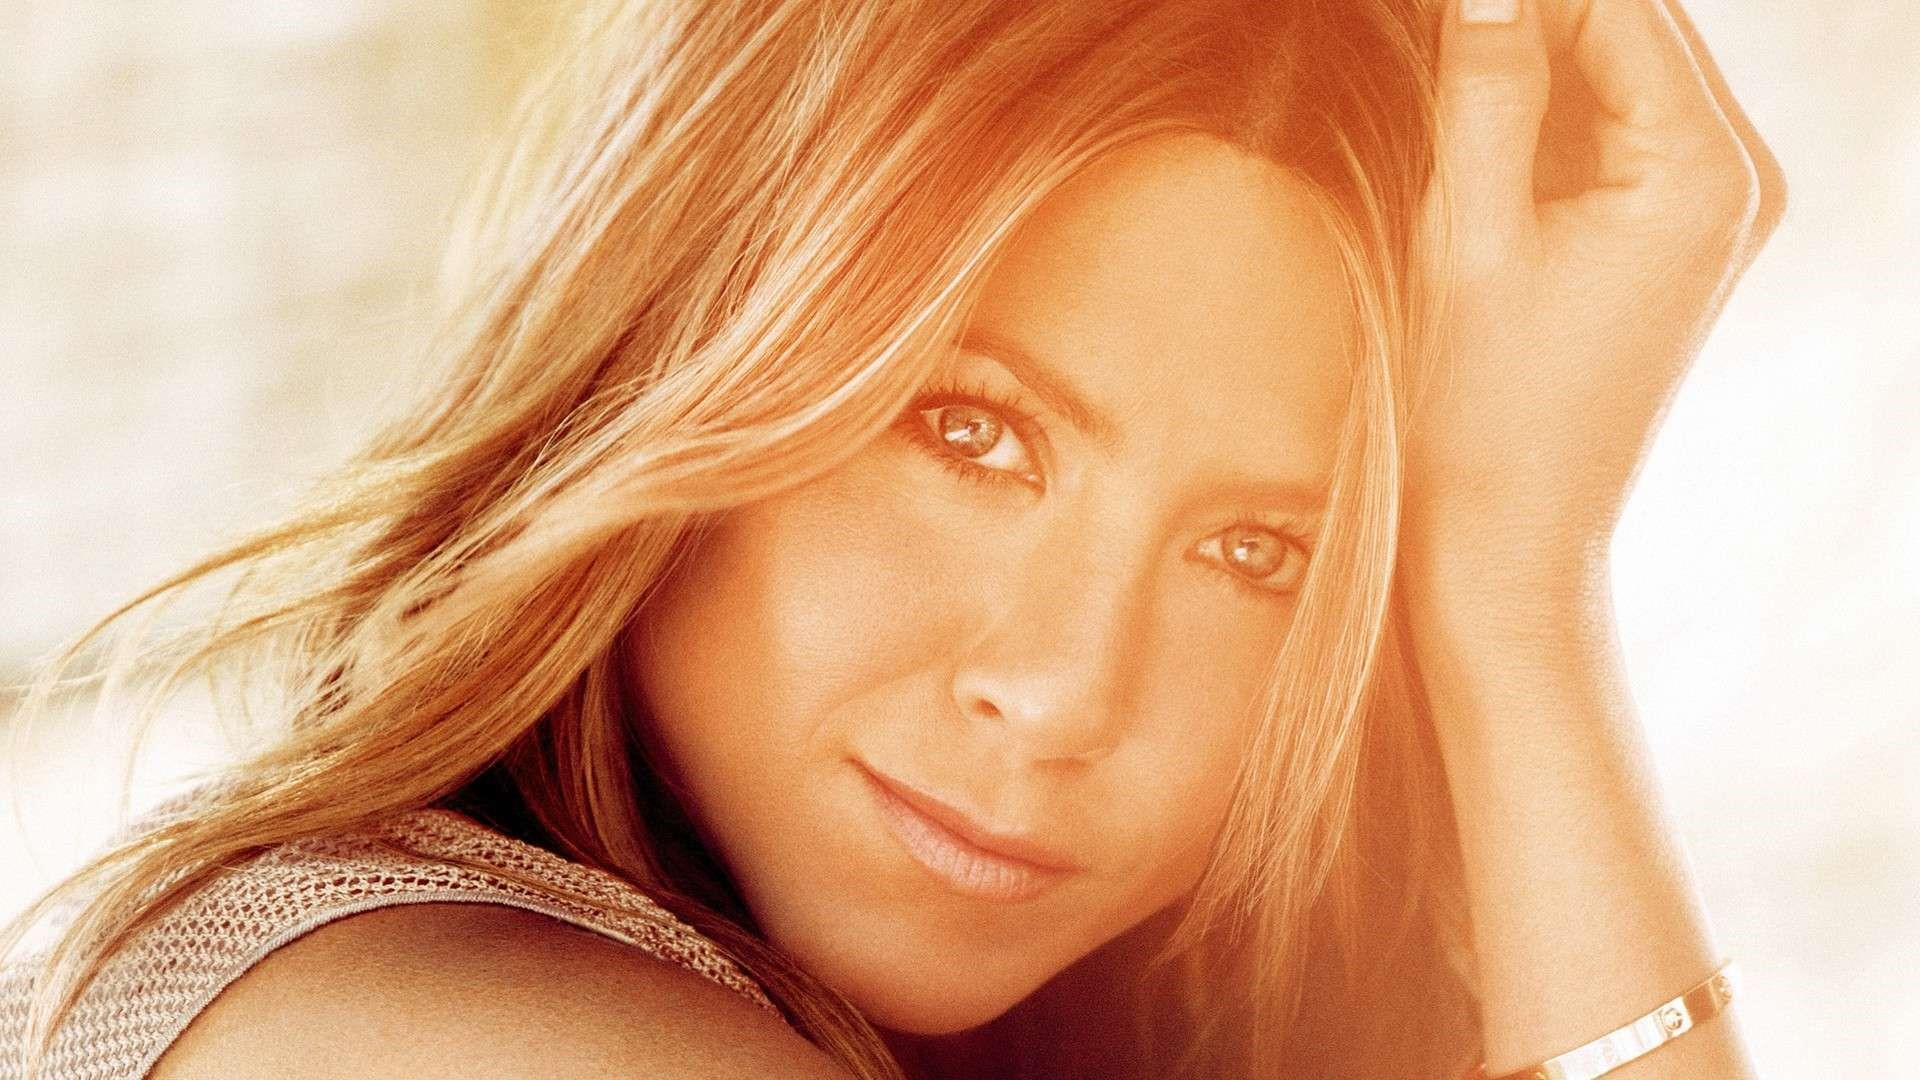 Jennifer Aniston Wallpapers 3